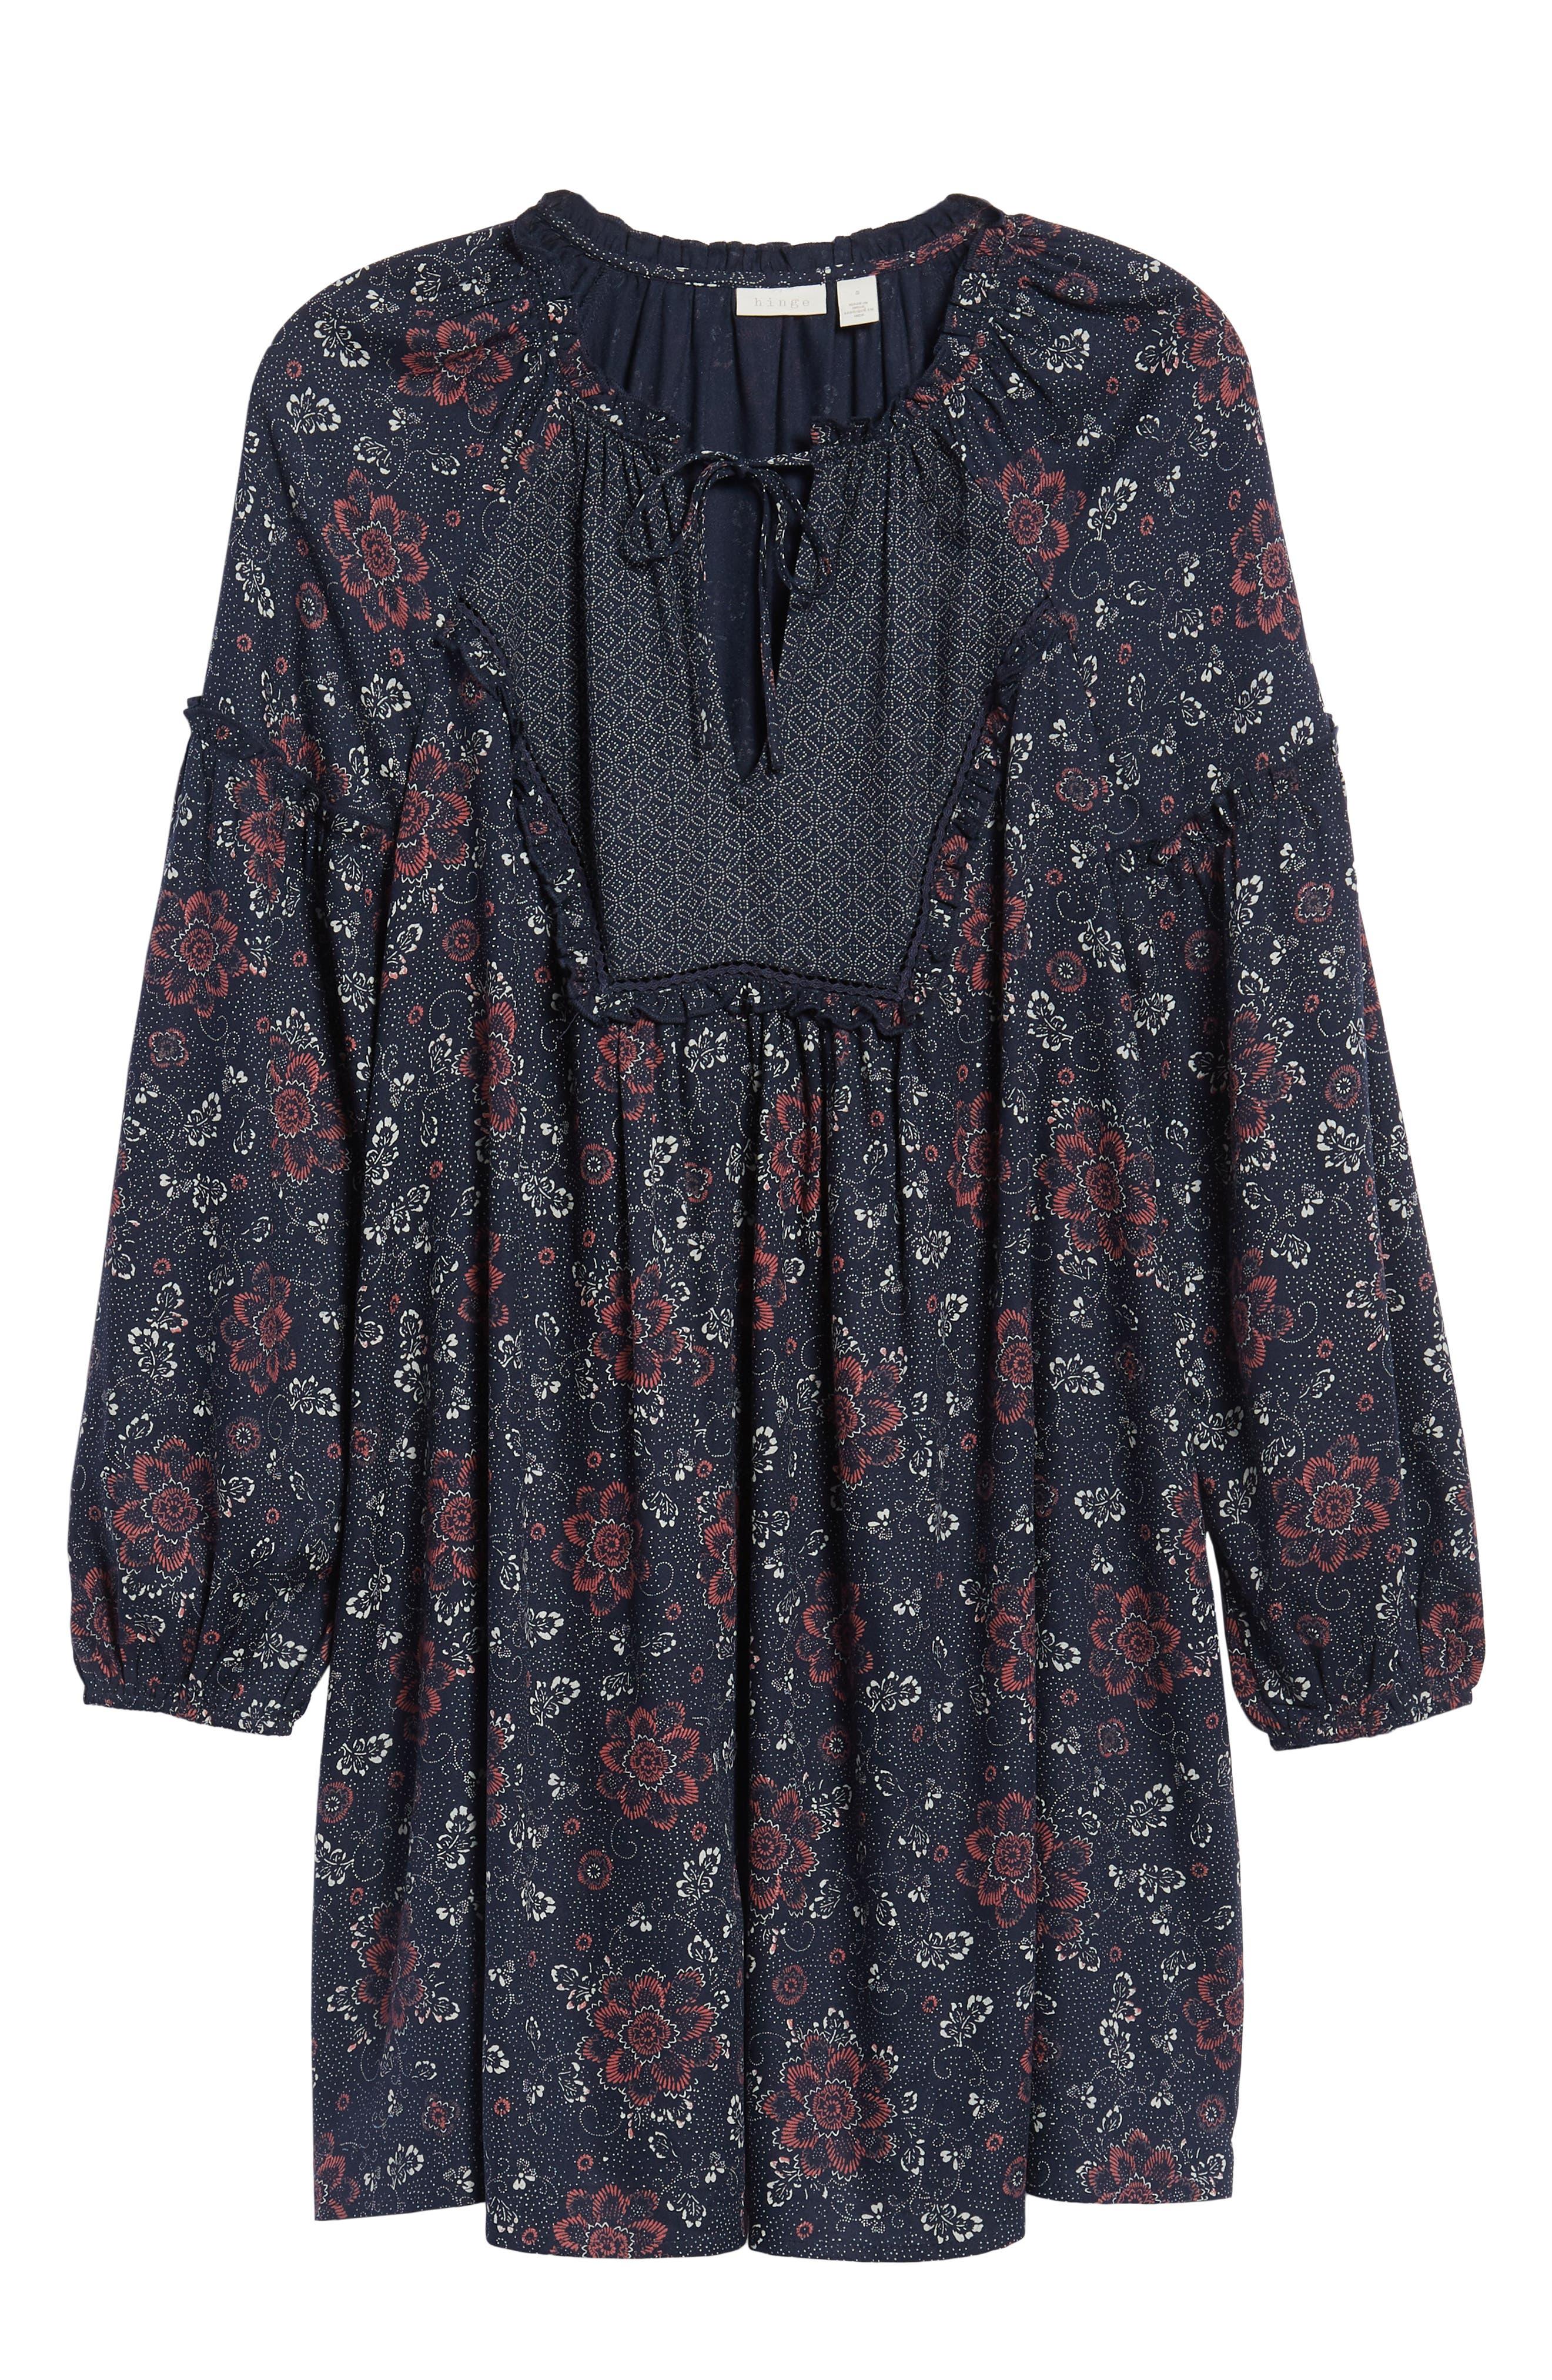 Mix Print Peasant Dress,                             Alternate thumbnail 7, color,                             NAVY NIGHT WOVEN FLORAL MIX